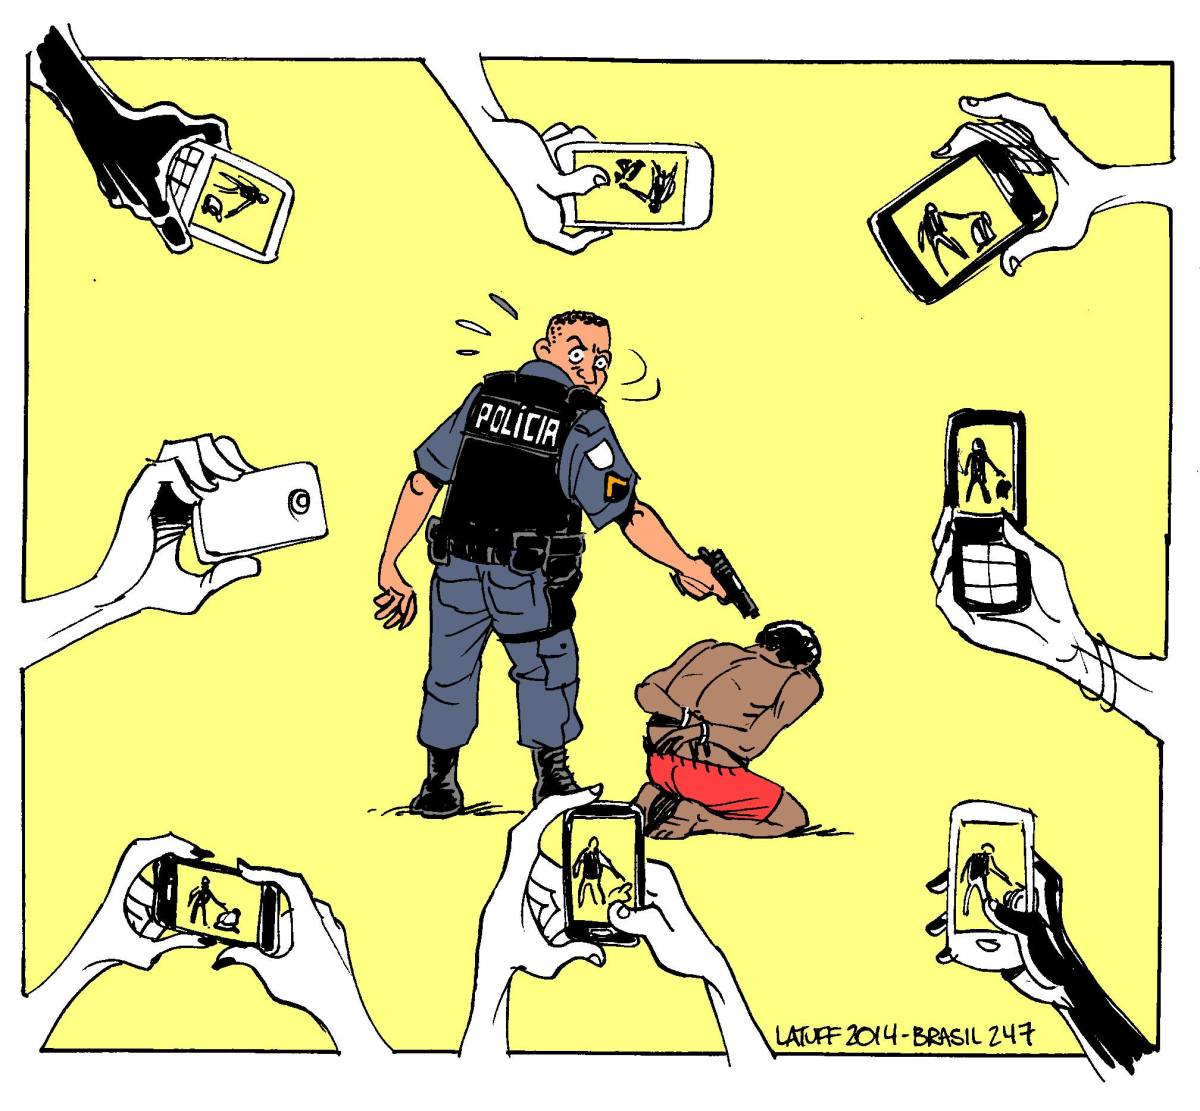 Charge do Latuff - Violência Policial e tecnologia